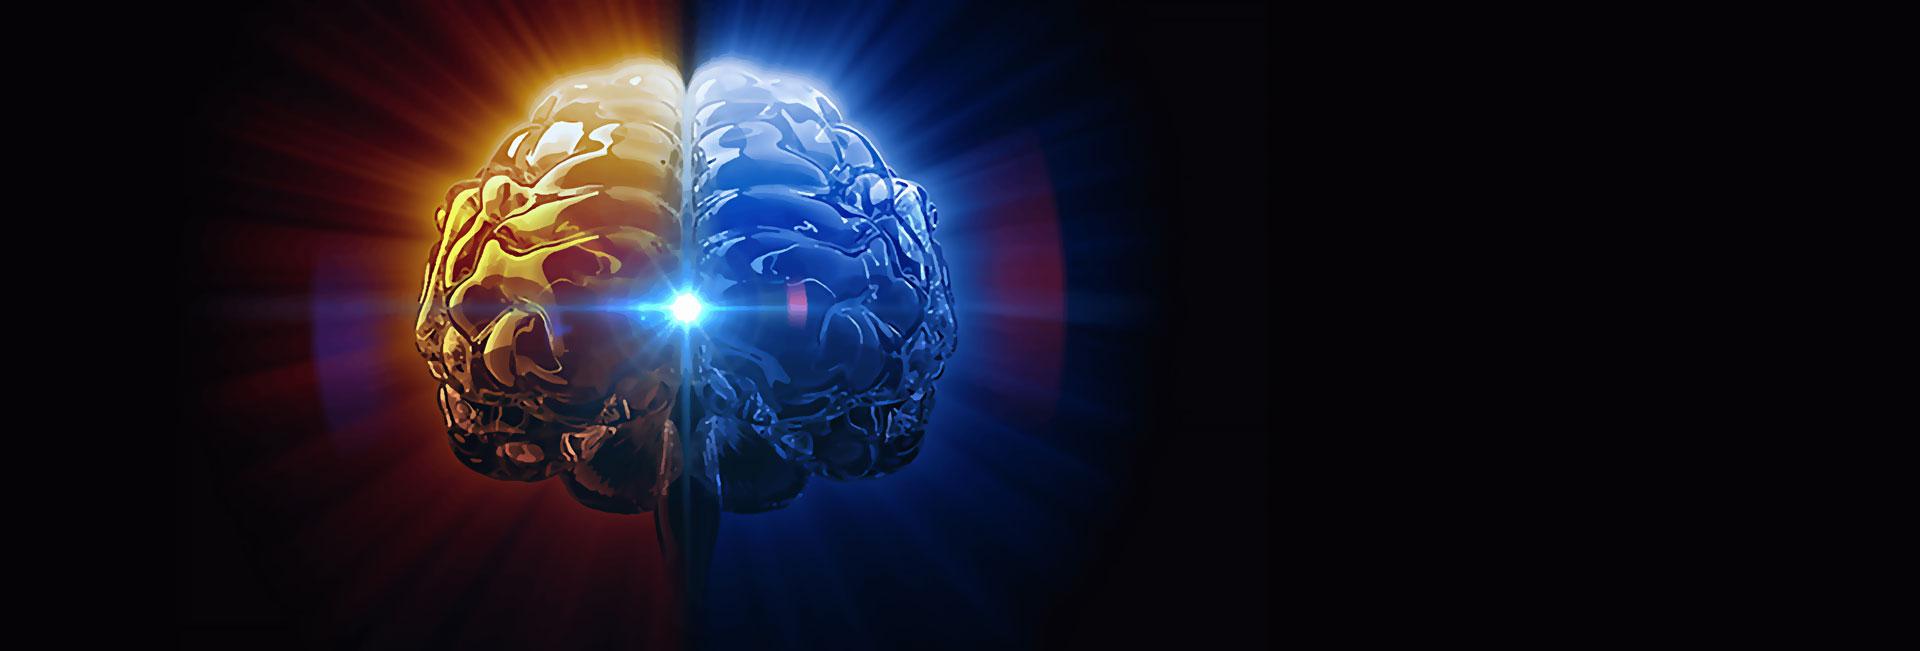 Webinar της International Neuropsychological Society σχετικά με τη διαδικτυακή νευροψυχολογική εκτίμηση.